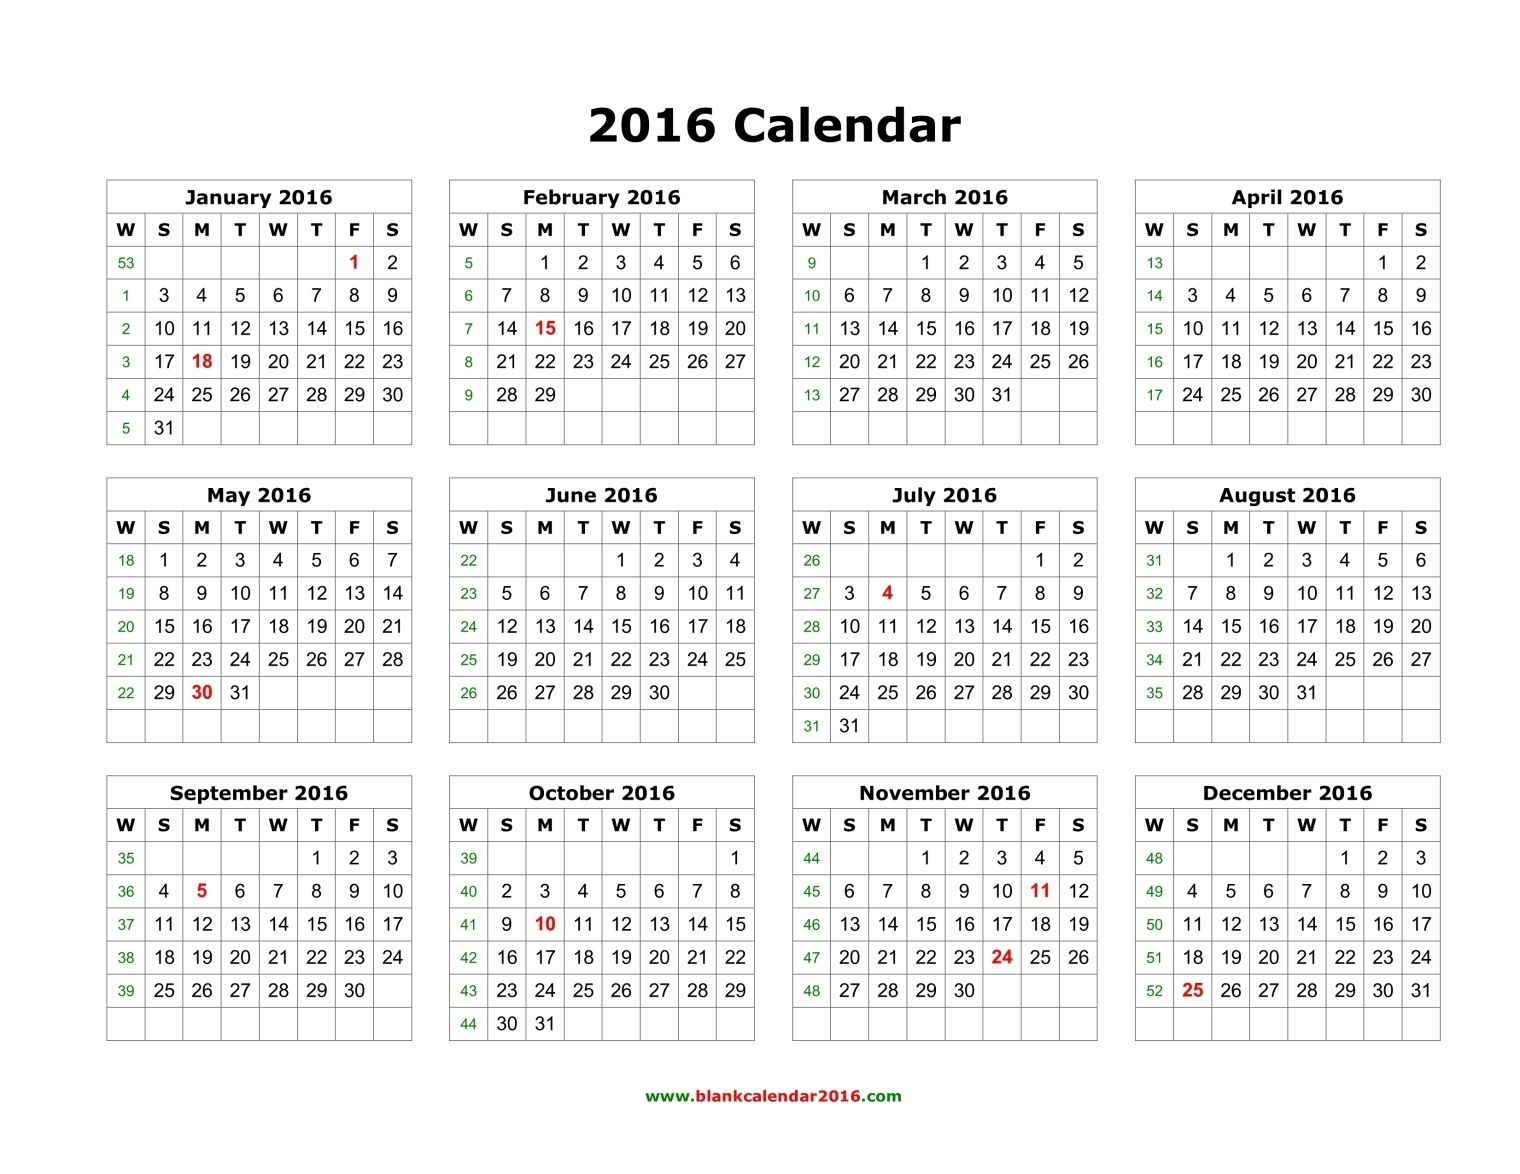 Blank Calendar 2016 | Blank Monthly Calendar, Printable